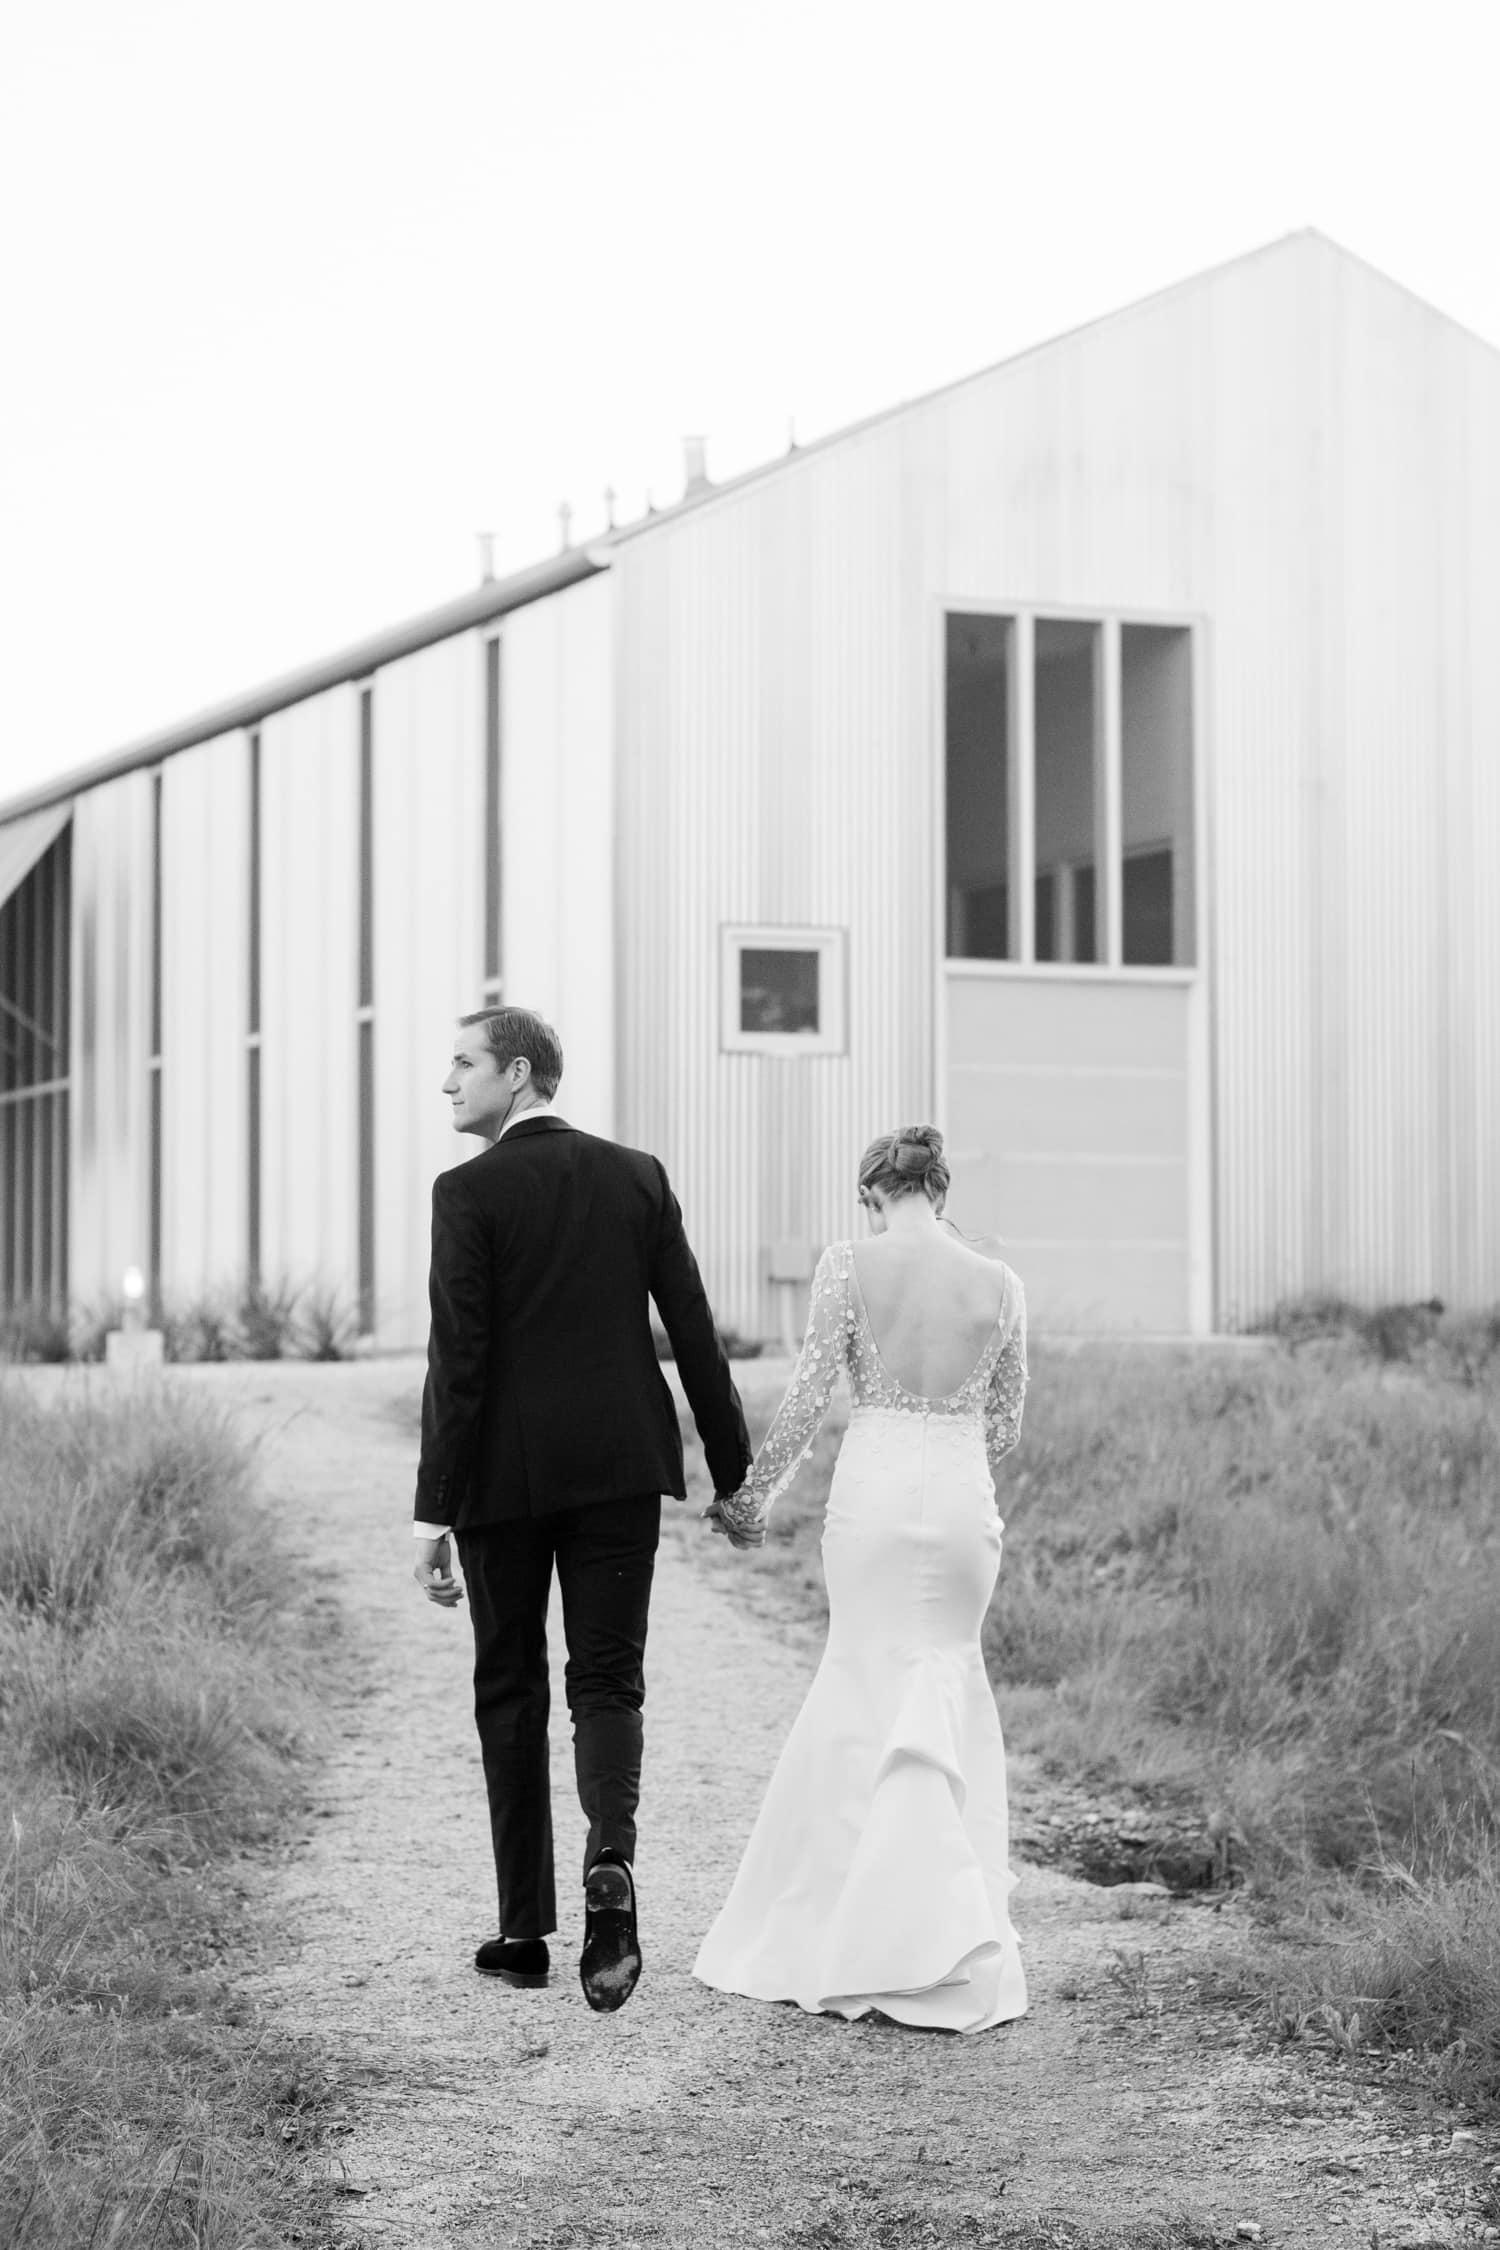 PROSPECT_HOUSE_WEDDING_AUSTIN_TX_MATTHEW_MOORE-00832.jpg